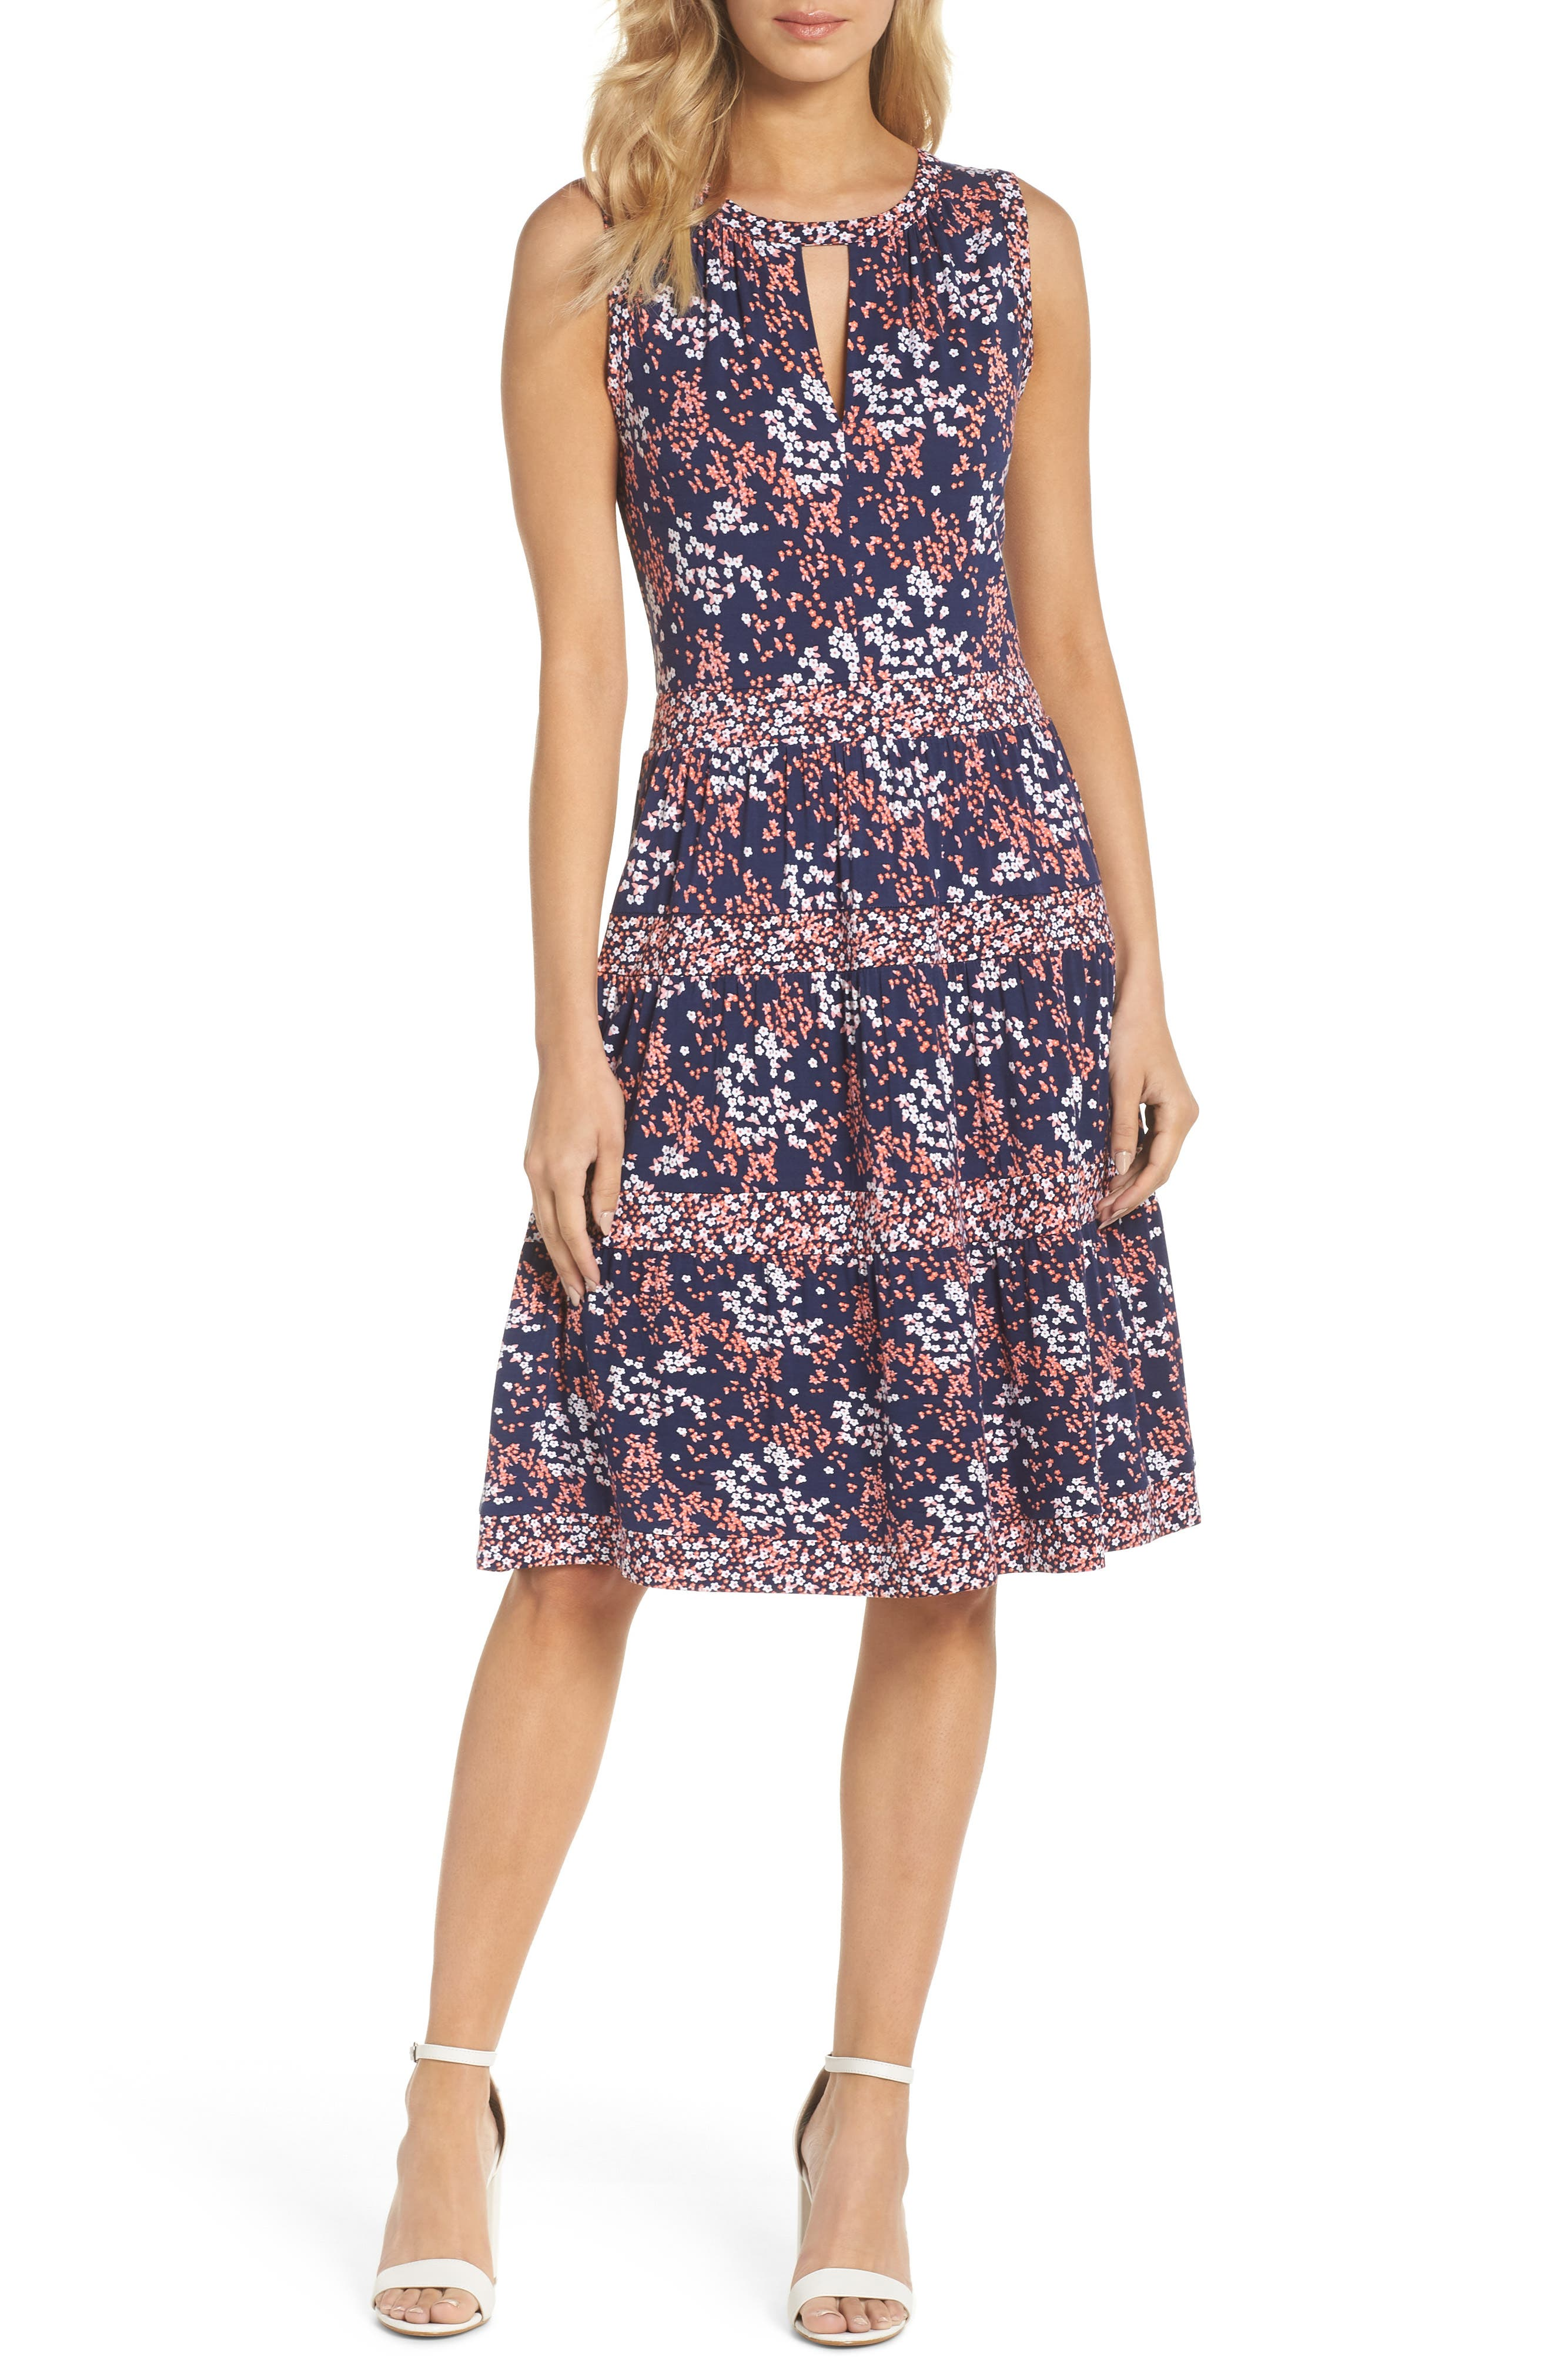 Blooms Border Tiered Dress,                             Main thumbnail 1, color,                             True Navy/ Bright Blush